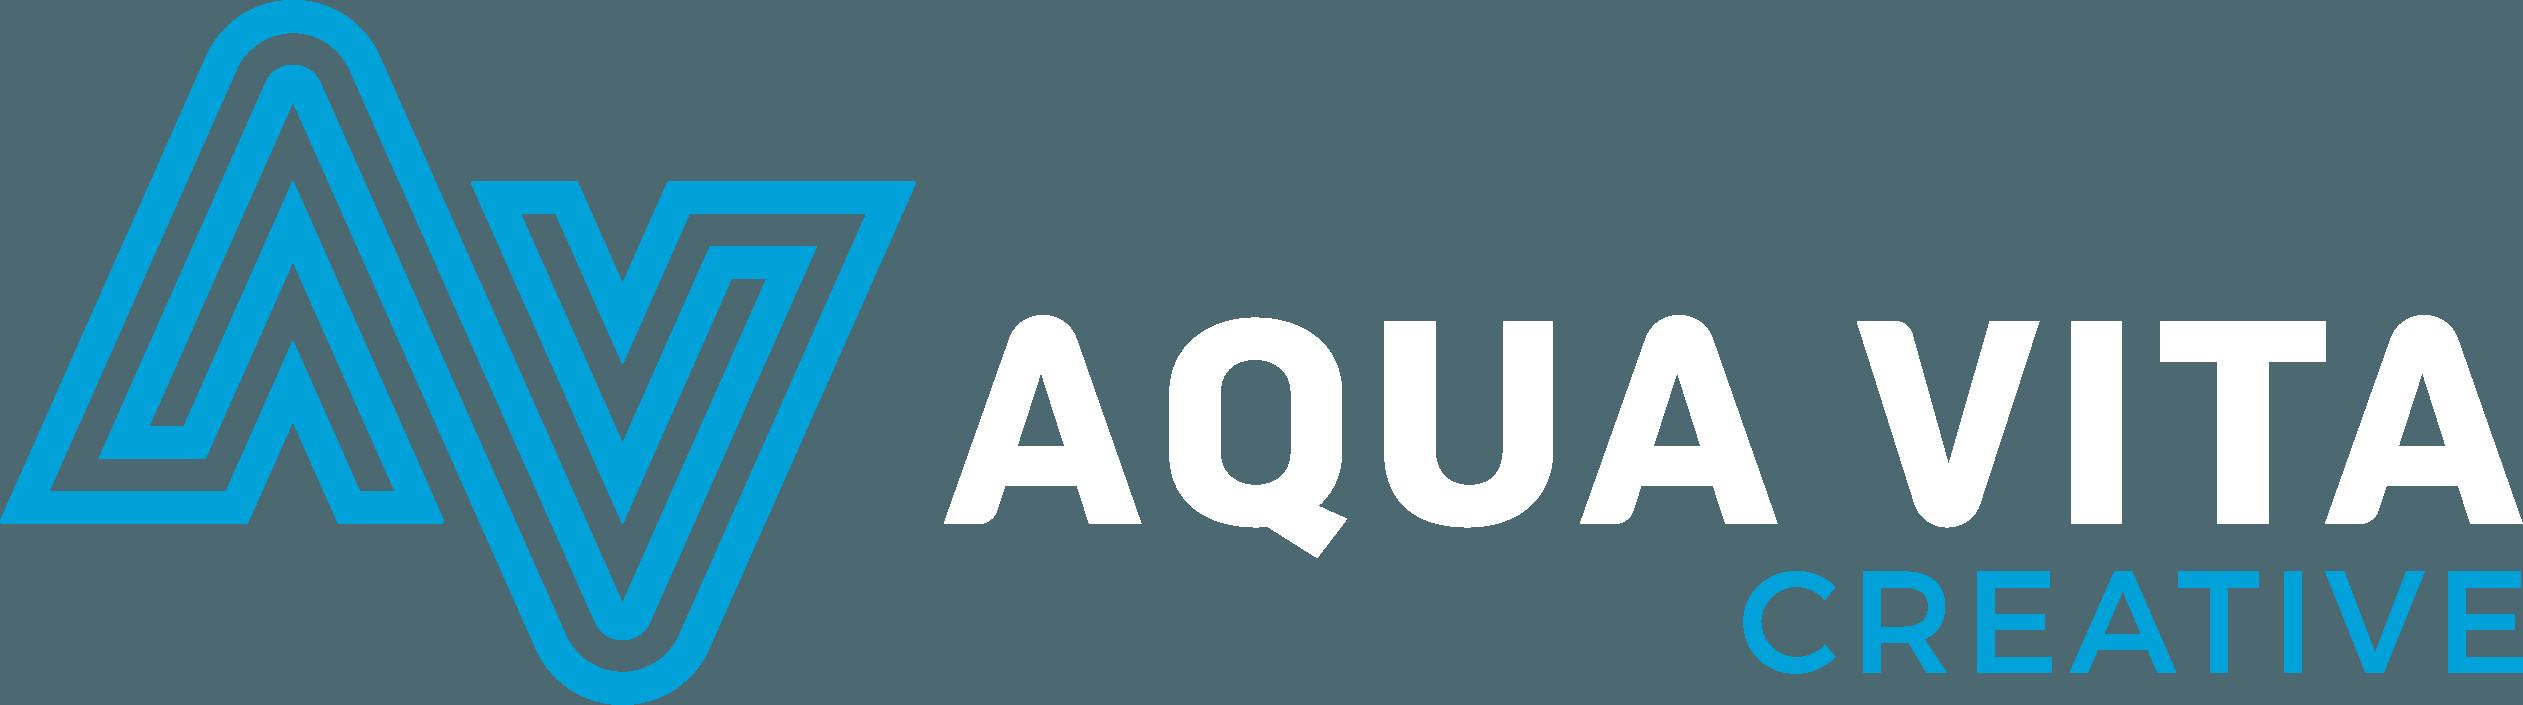 Aqua Vita Creative